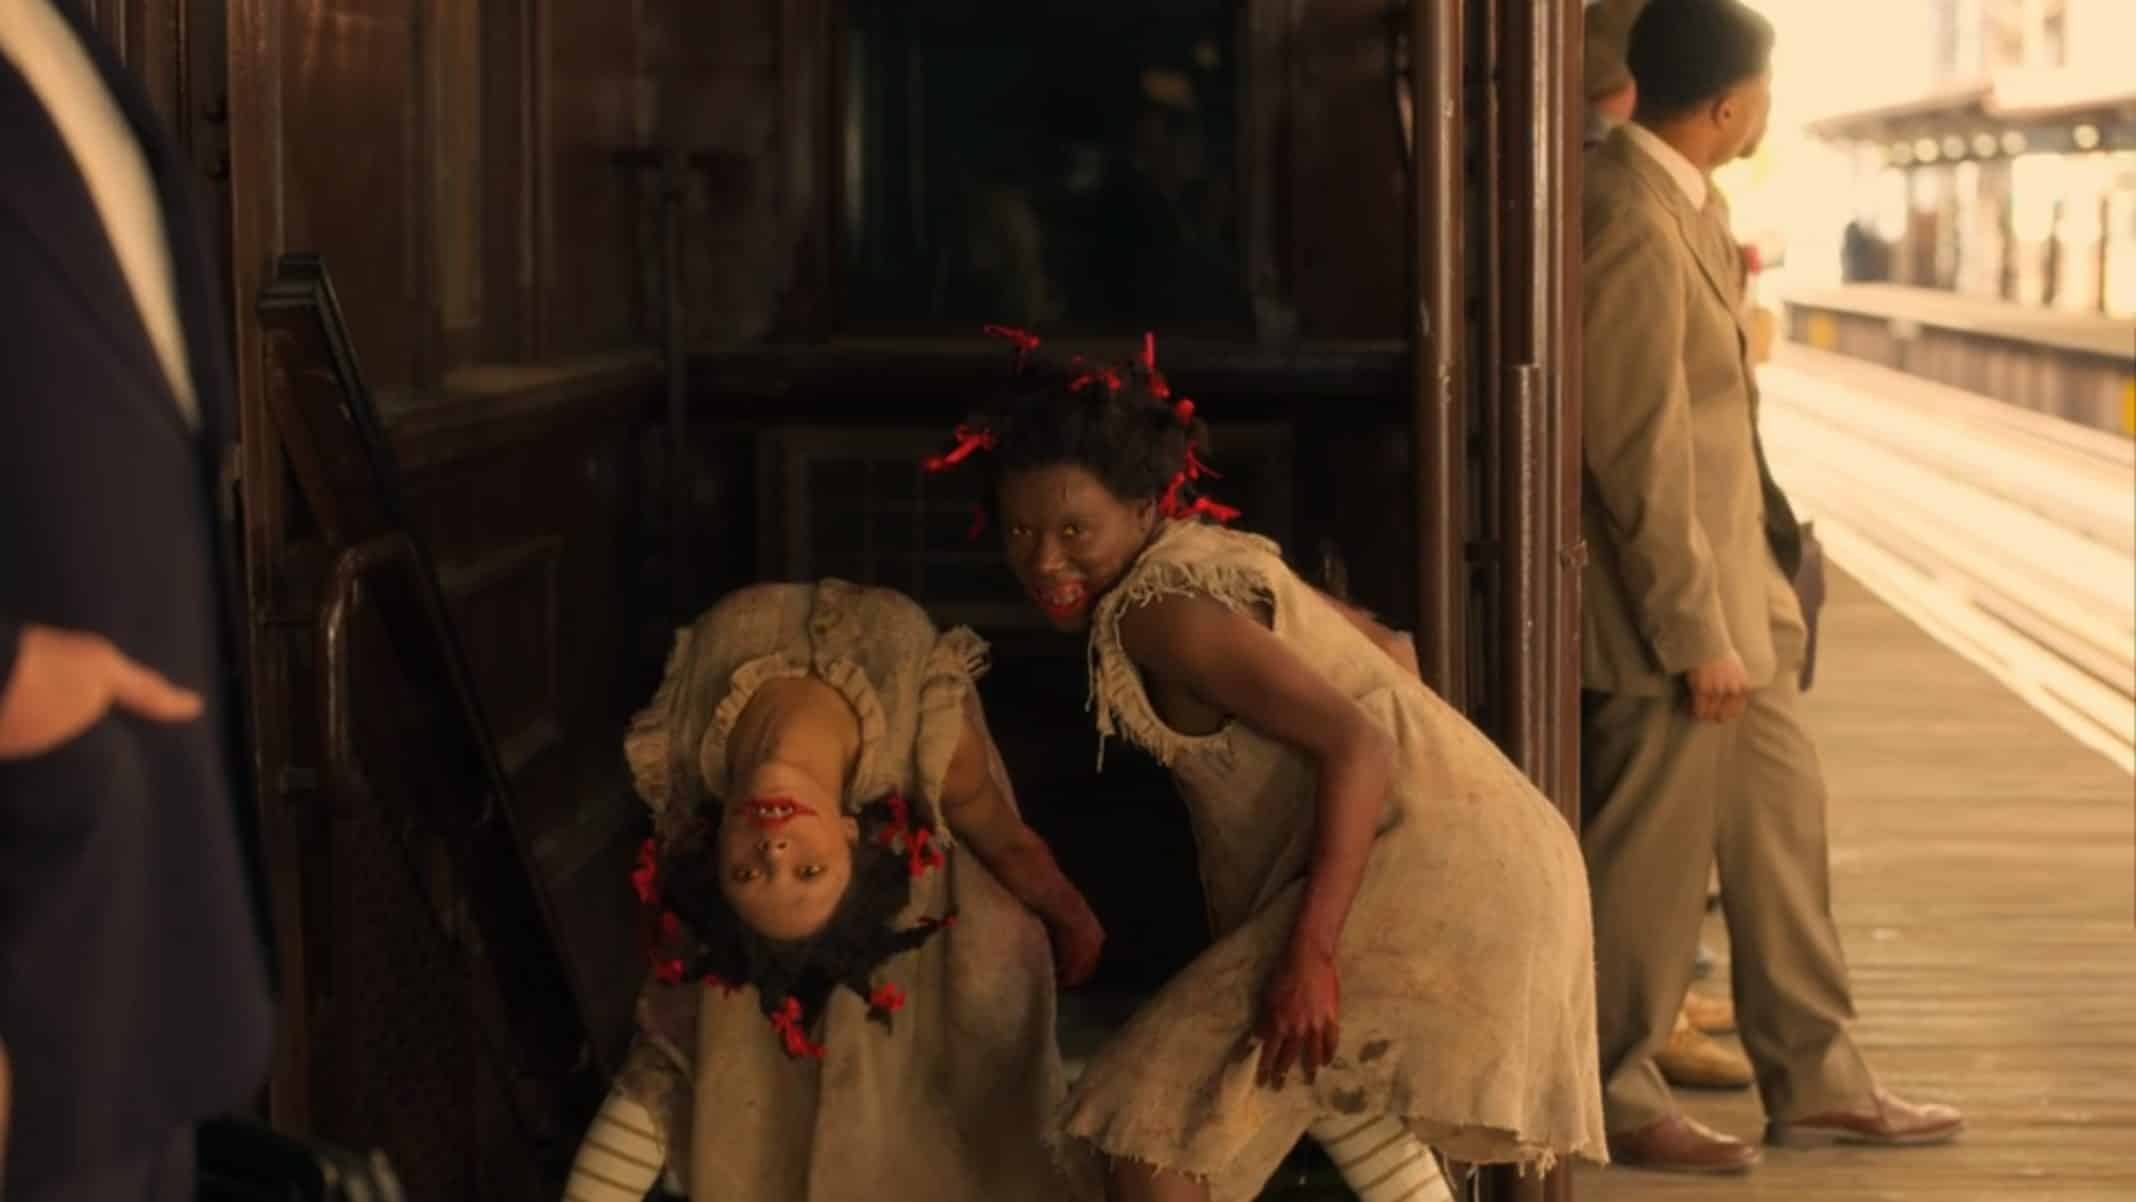 Topsy (Kaelynn Gobert-Harris) and Bopsy (Bianca Brewton) scaring Diana.